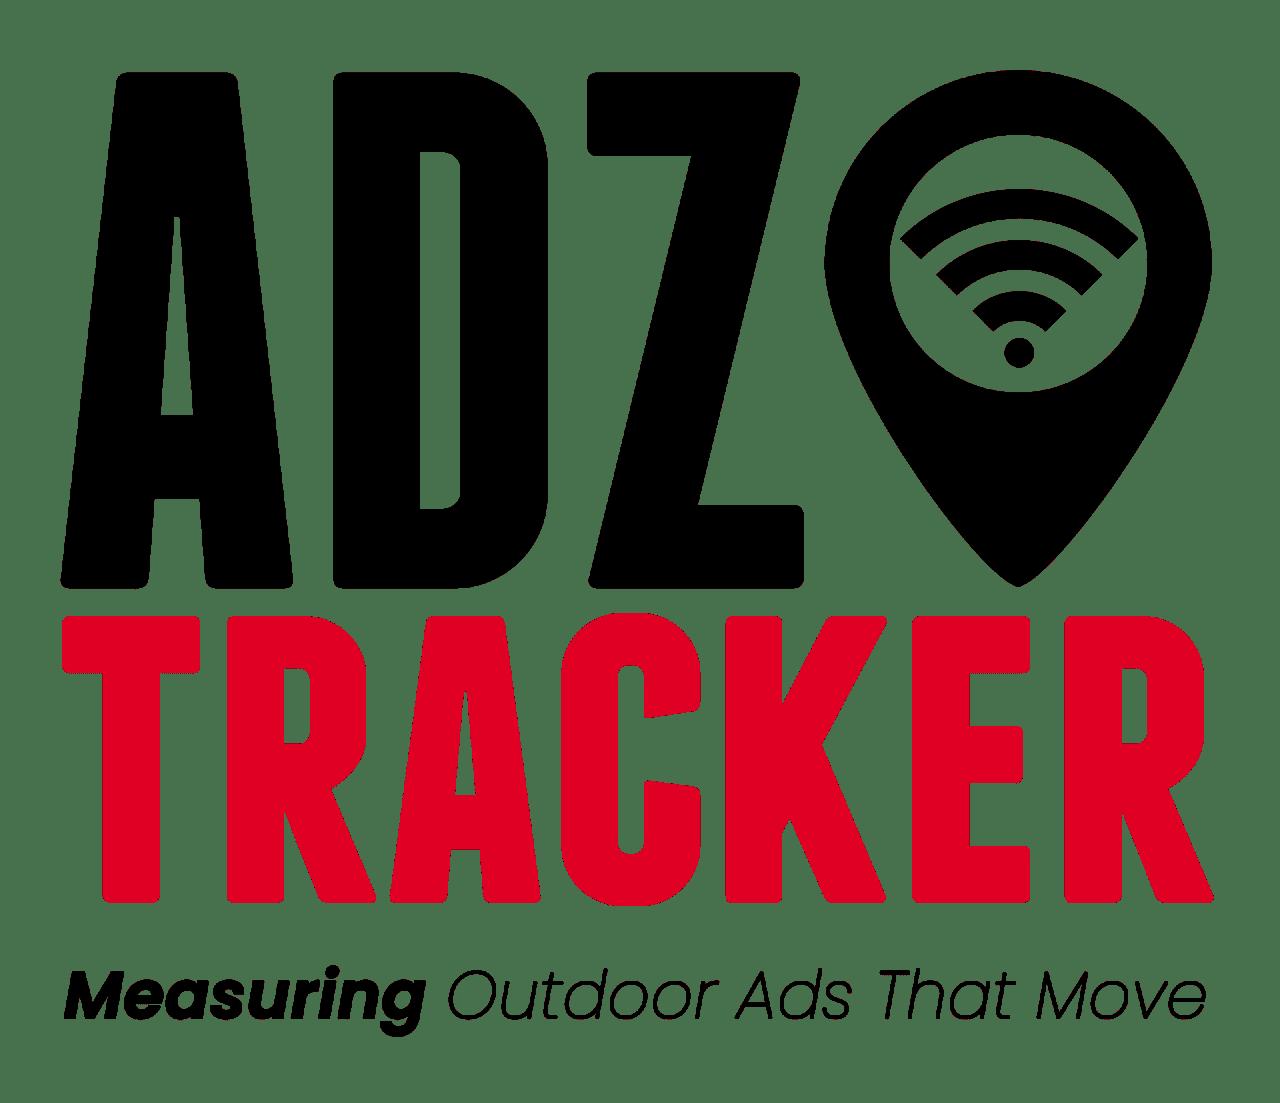 http://www.truckadz.co.uk/wp-content/uploads/2021/03/Adz-Tracker-V1-1-1280x1103.png